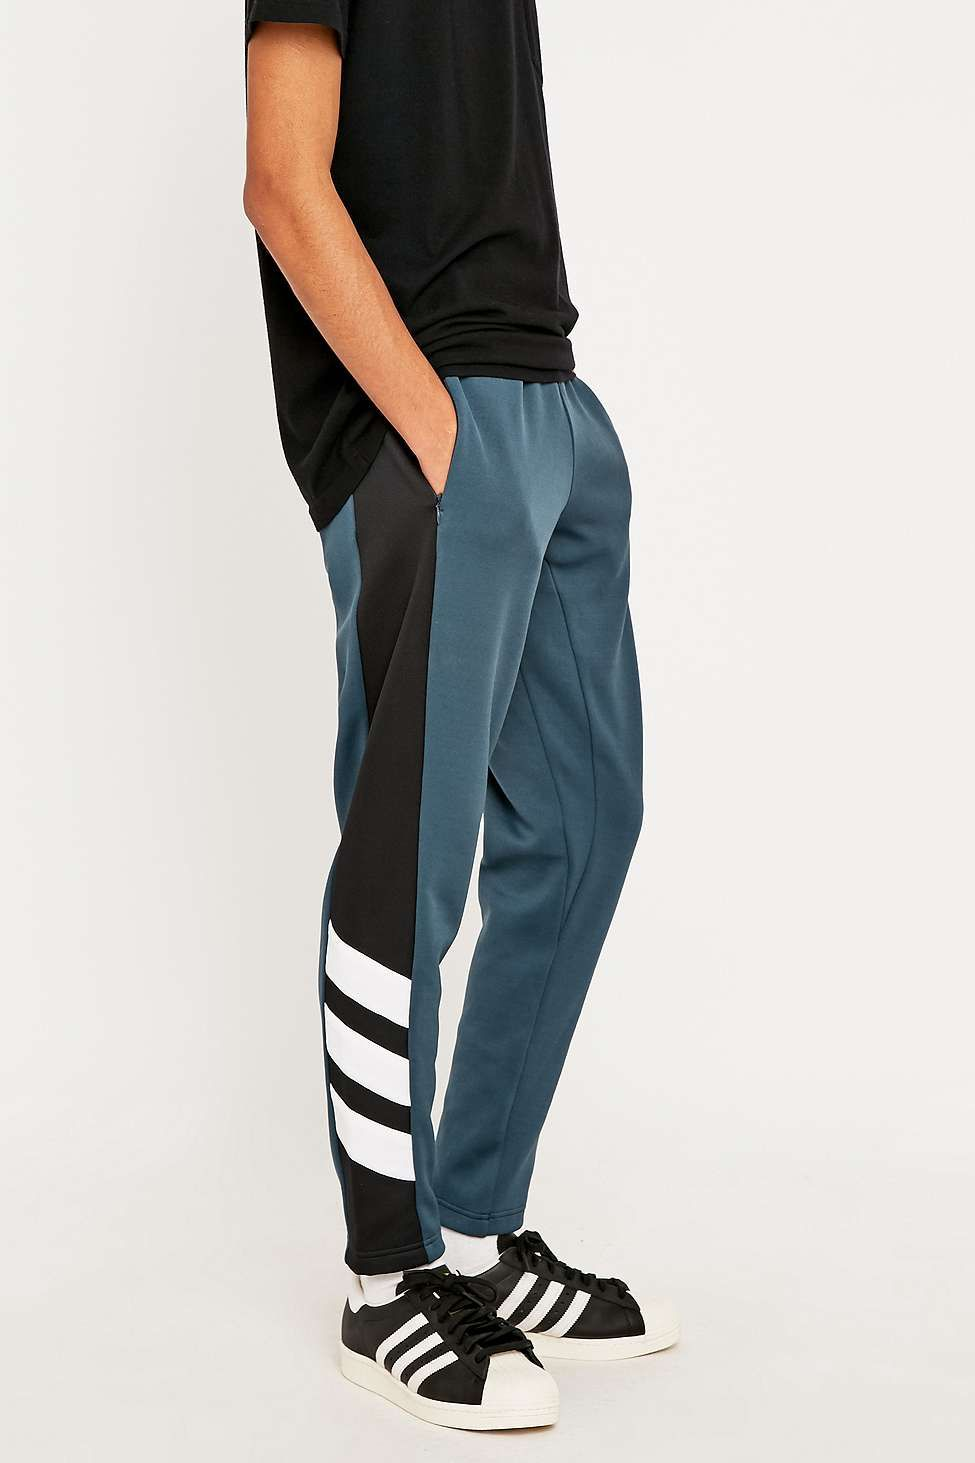 pantaloni adidas trefoil uomo